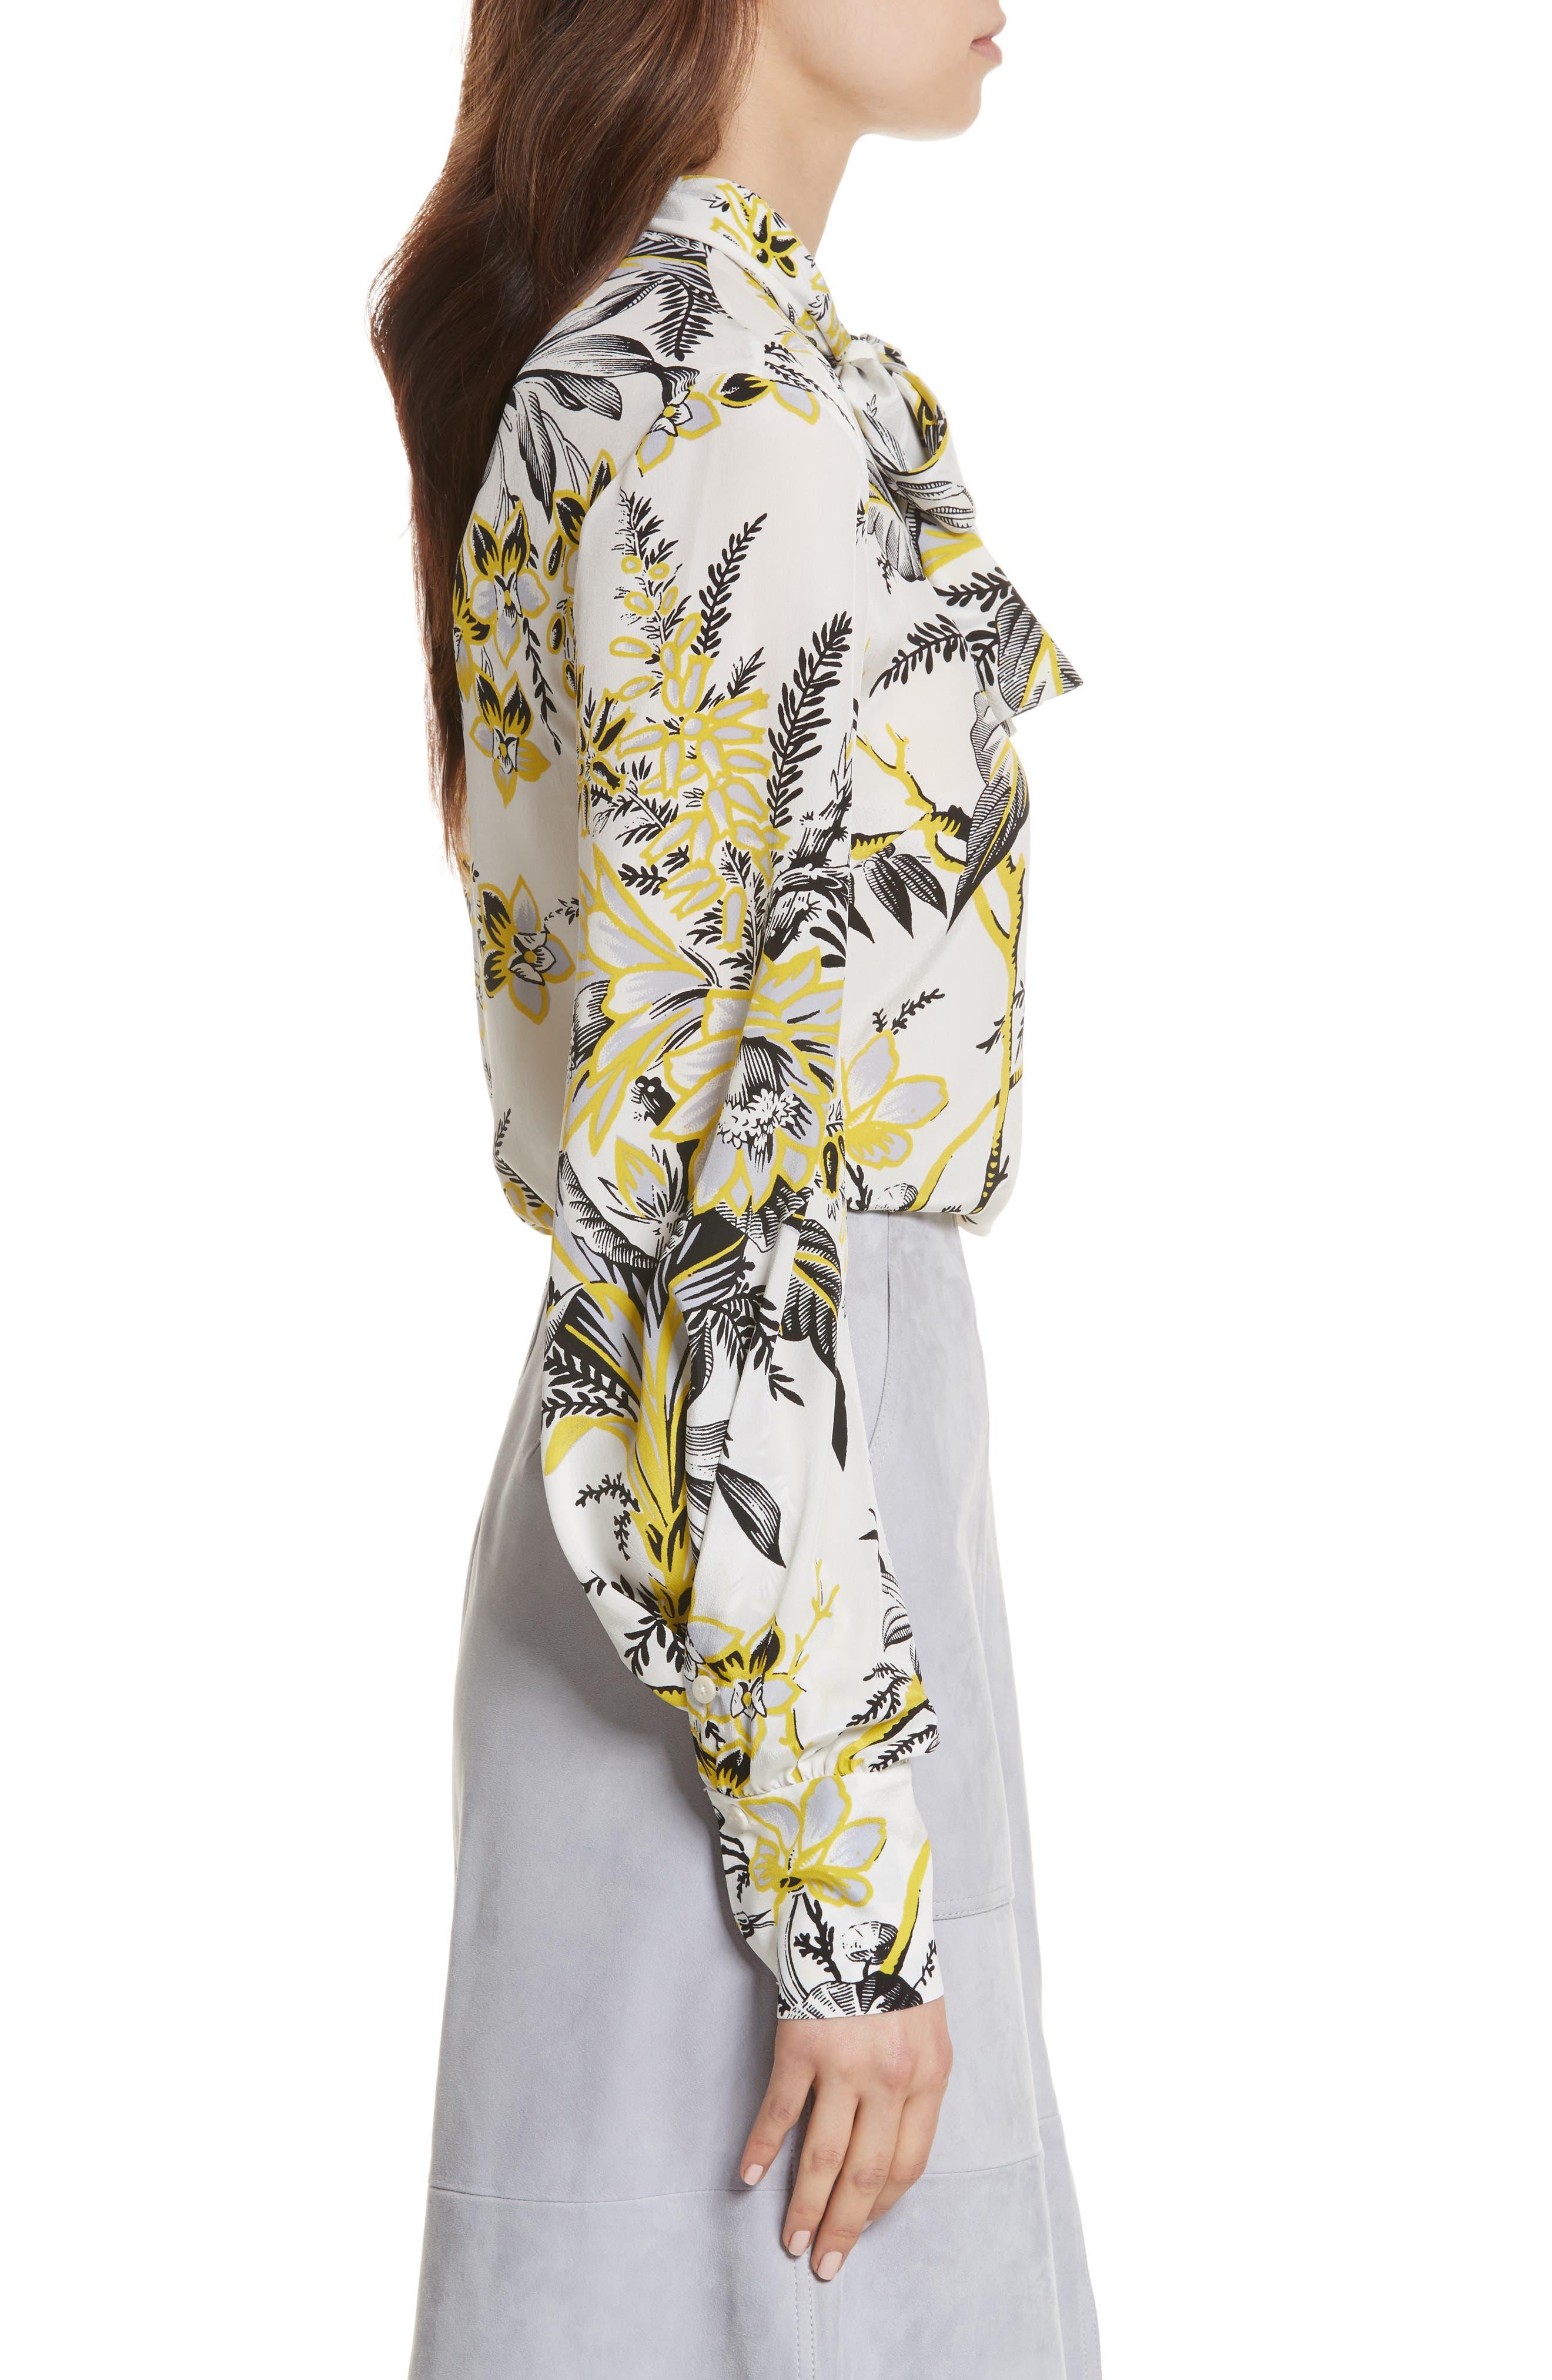 Diane von Furstenberg Tie Neck Silk Blouse,                             Alternate thumbnail 3, color,                             Avalon Ivory